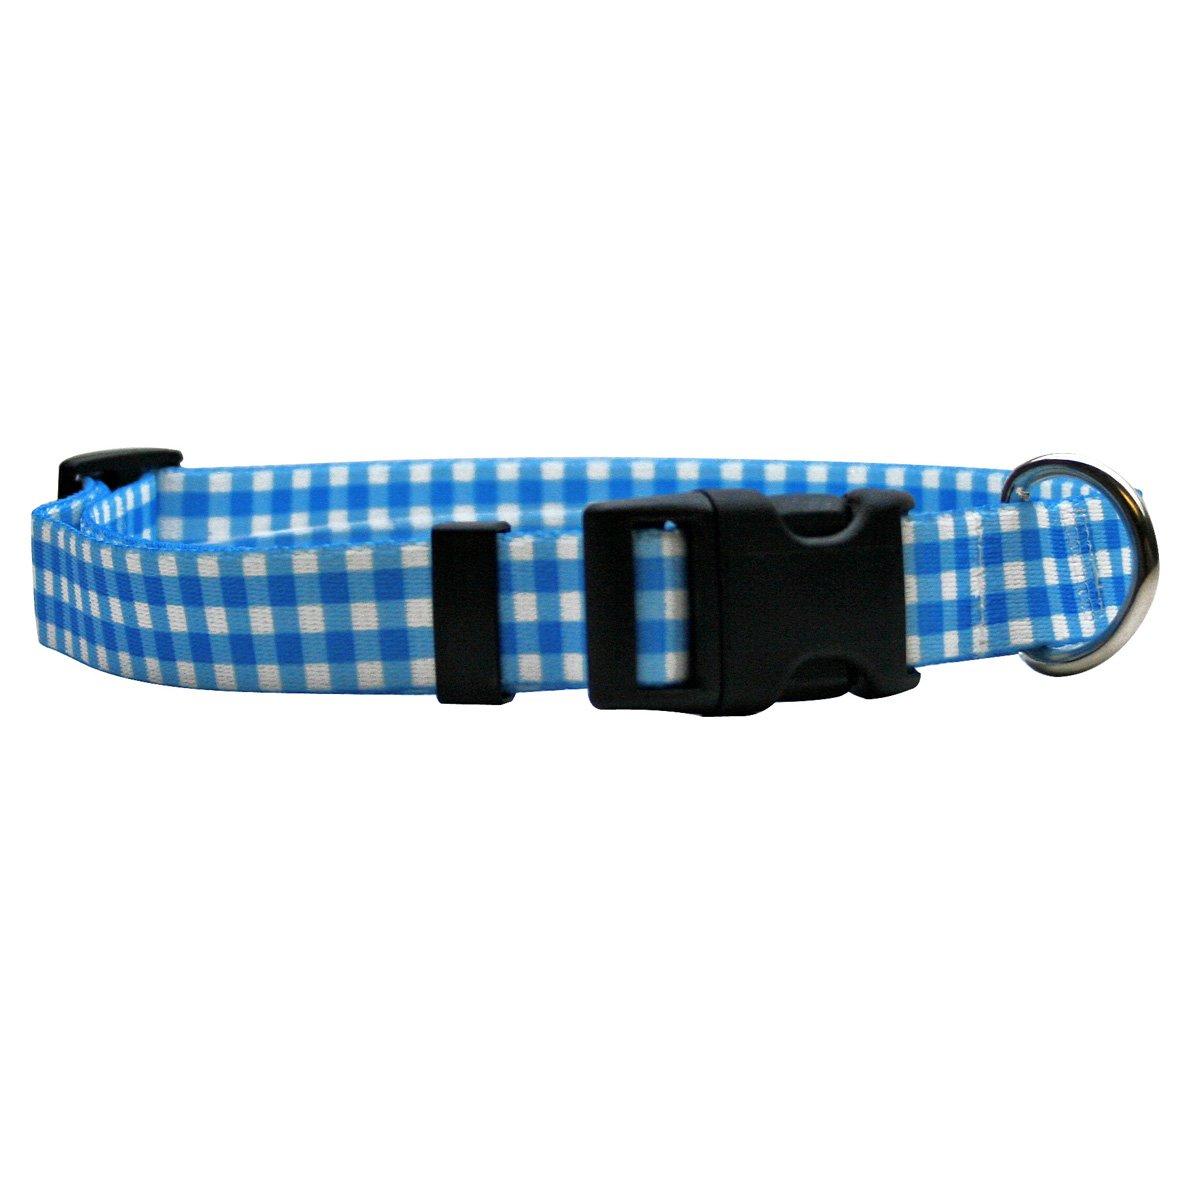 Yellow Dog Design Gingham Blue Dog Collar Fits Neck 14 to 20'', Medium 1'' Wide